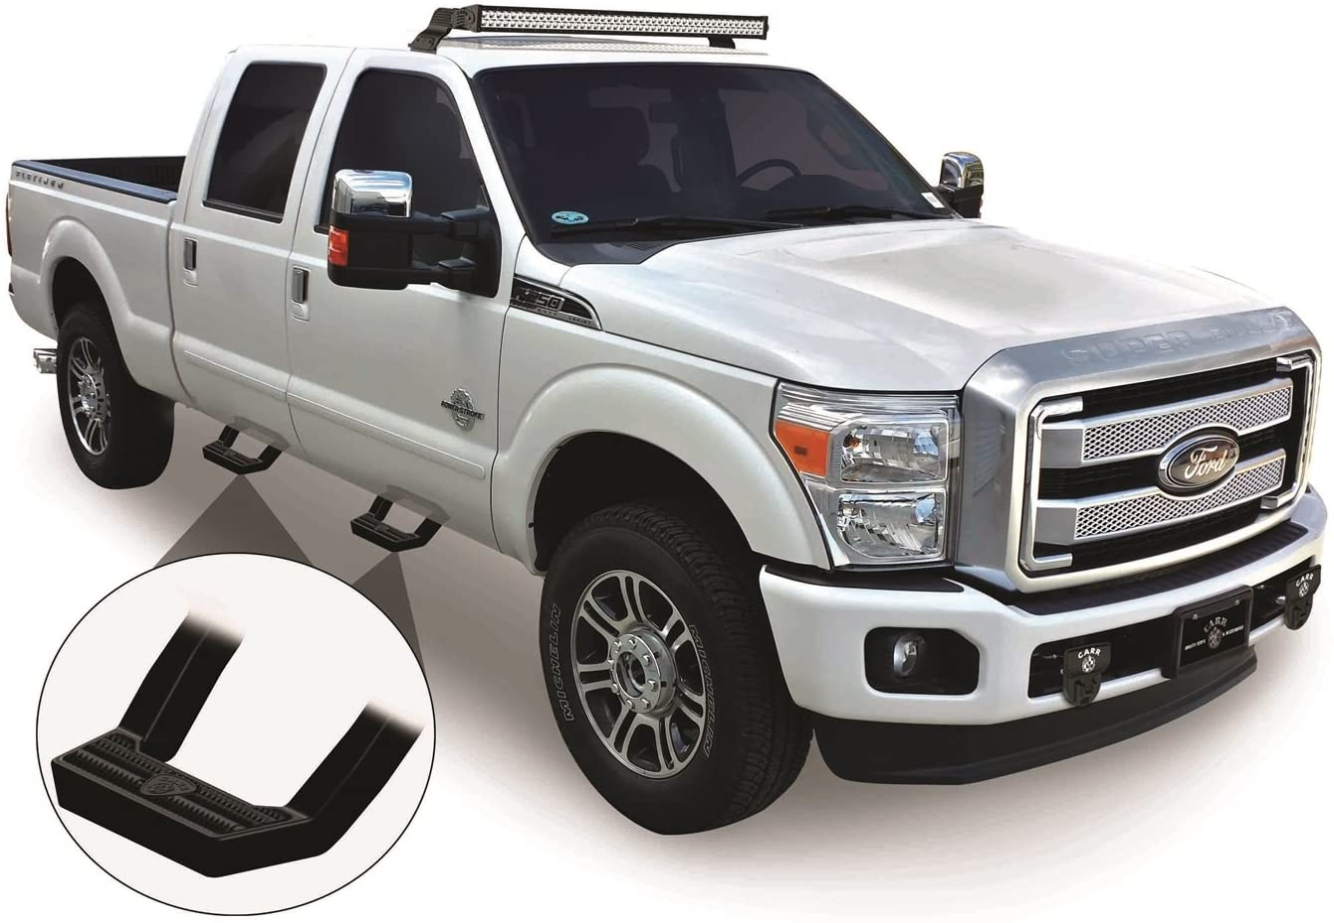 Carr 103994-1 Truck Step